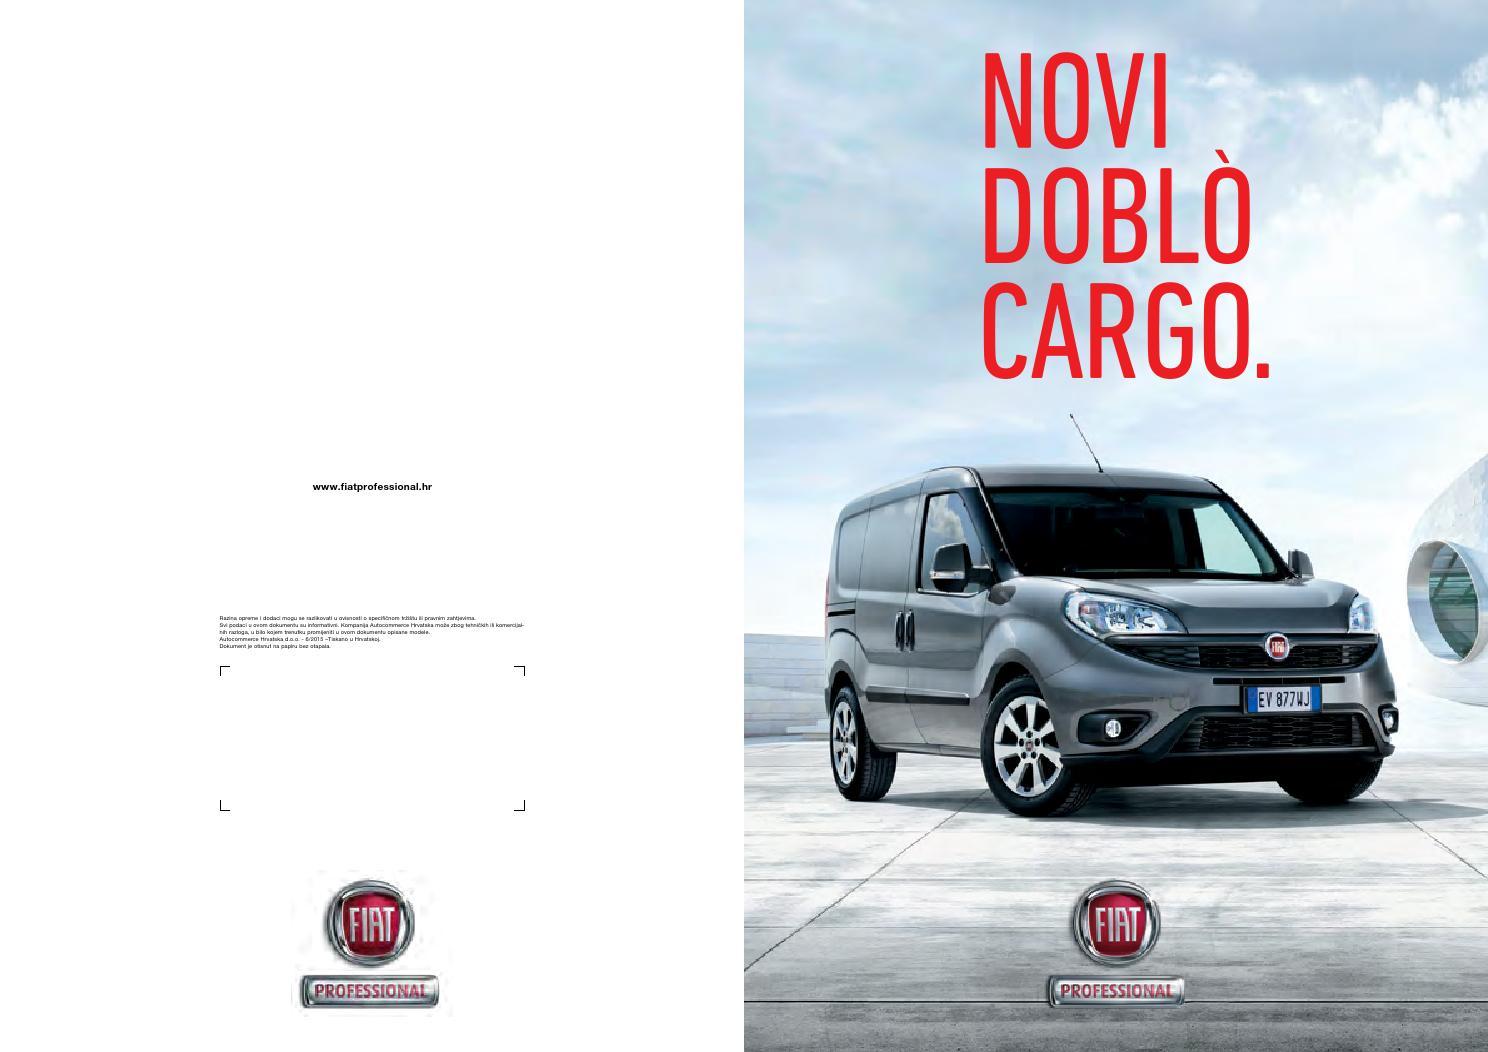 fiat doblo 2015 katalogkariĆ automobili, fiat, alfa romeo - issuu